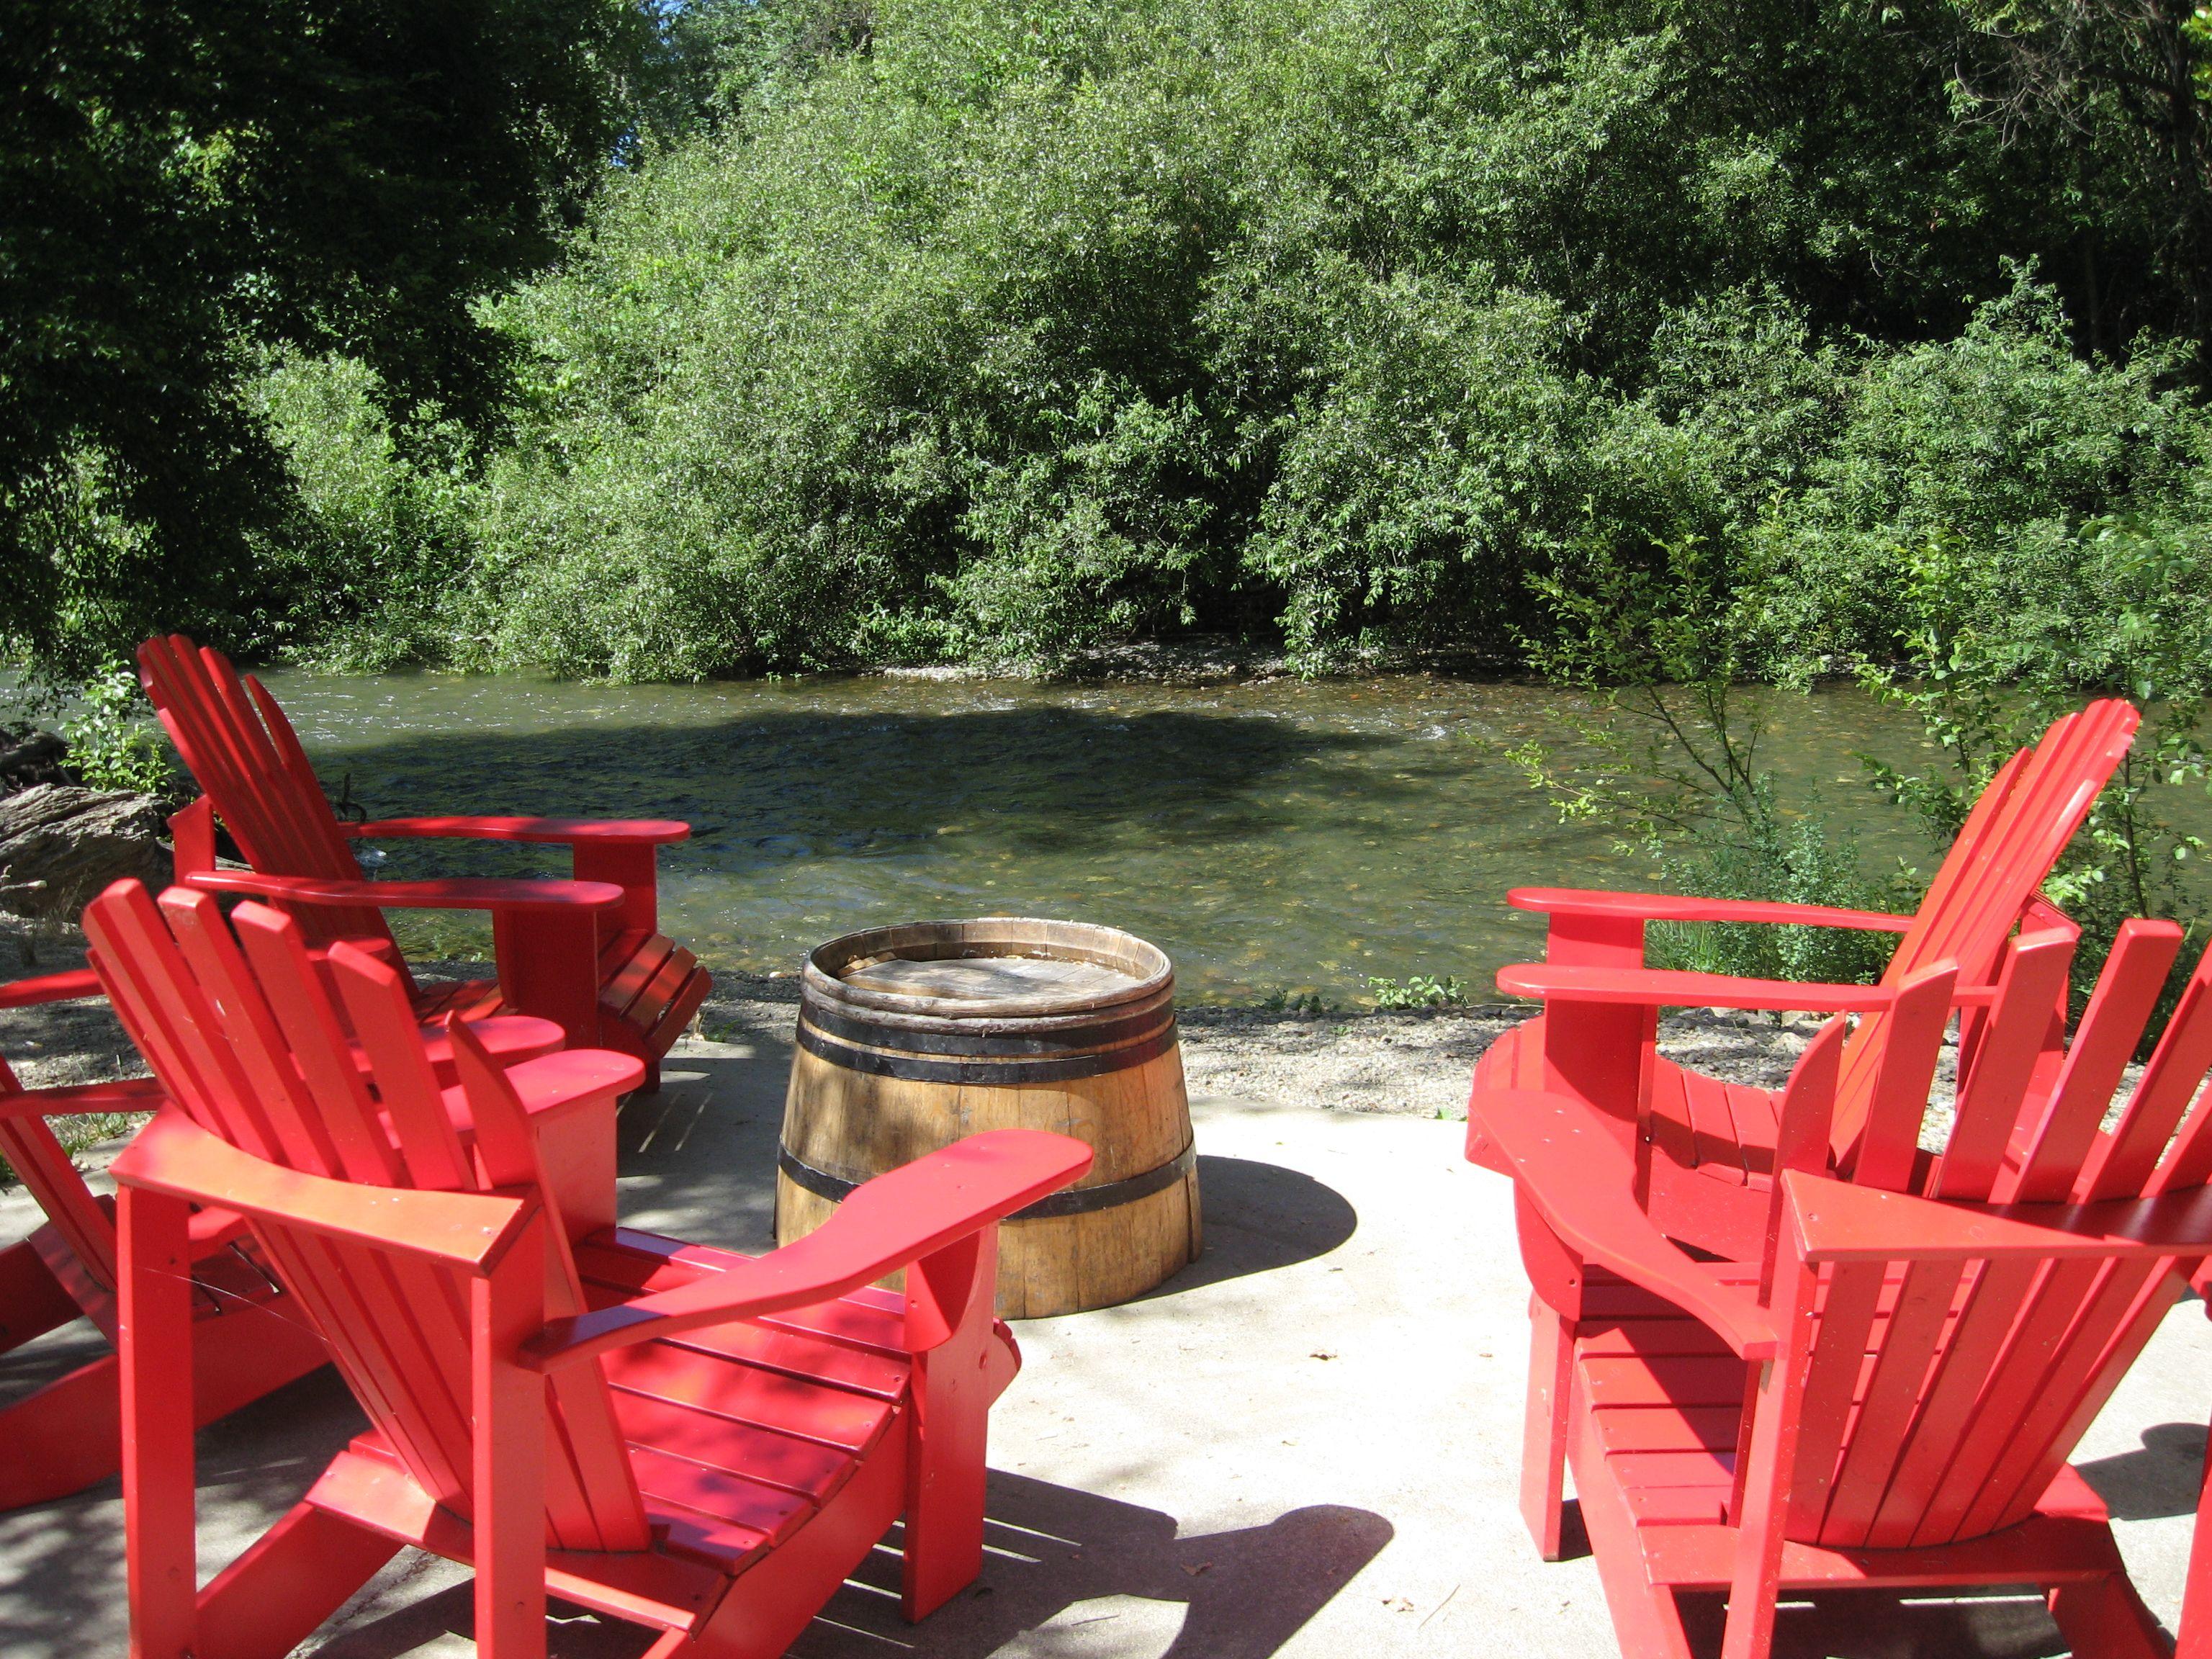 Truett Hurst Vineyard Looks Like Bs S Kind Of Place Red Adirondack Chairs Winery Healdsburg